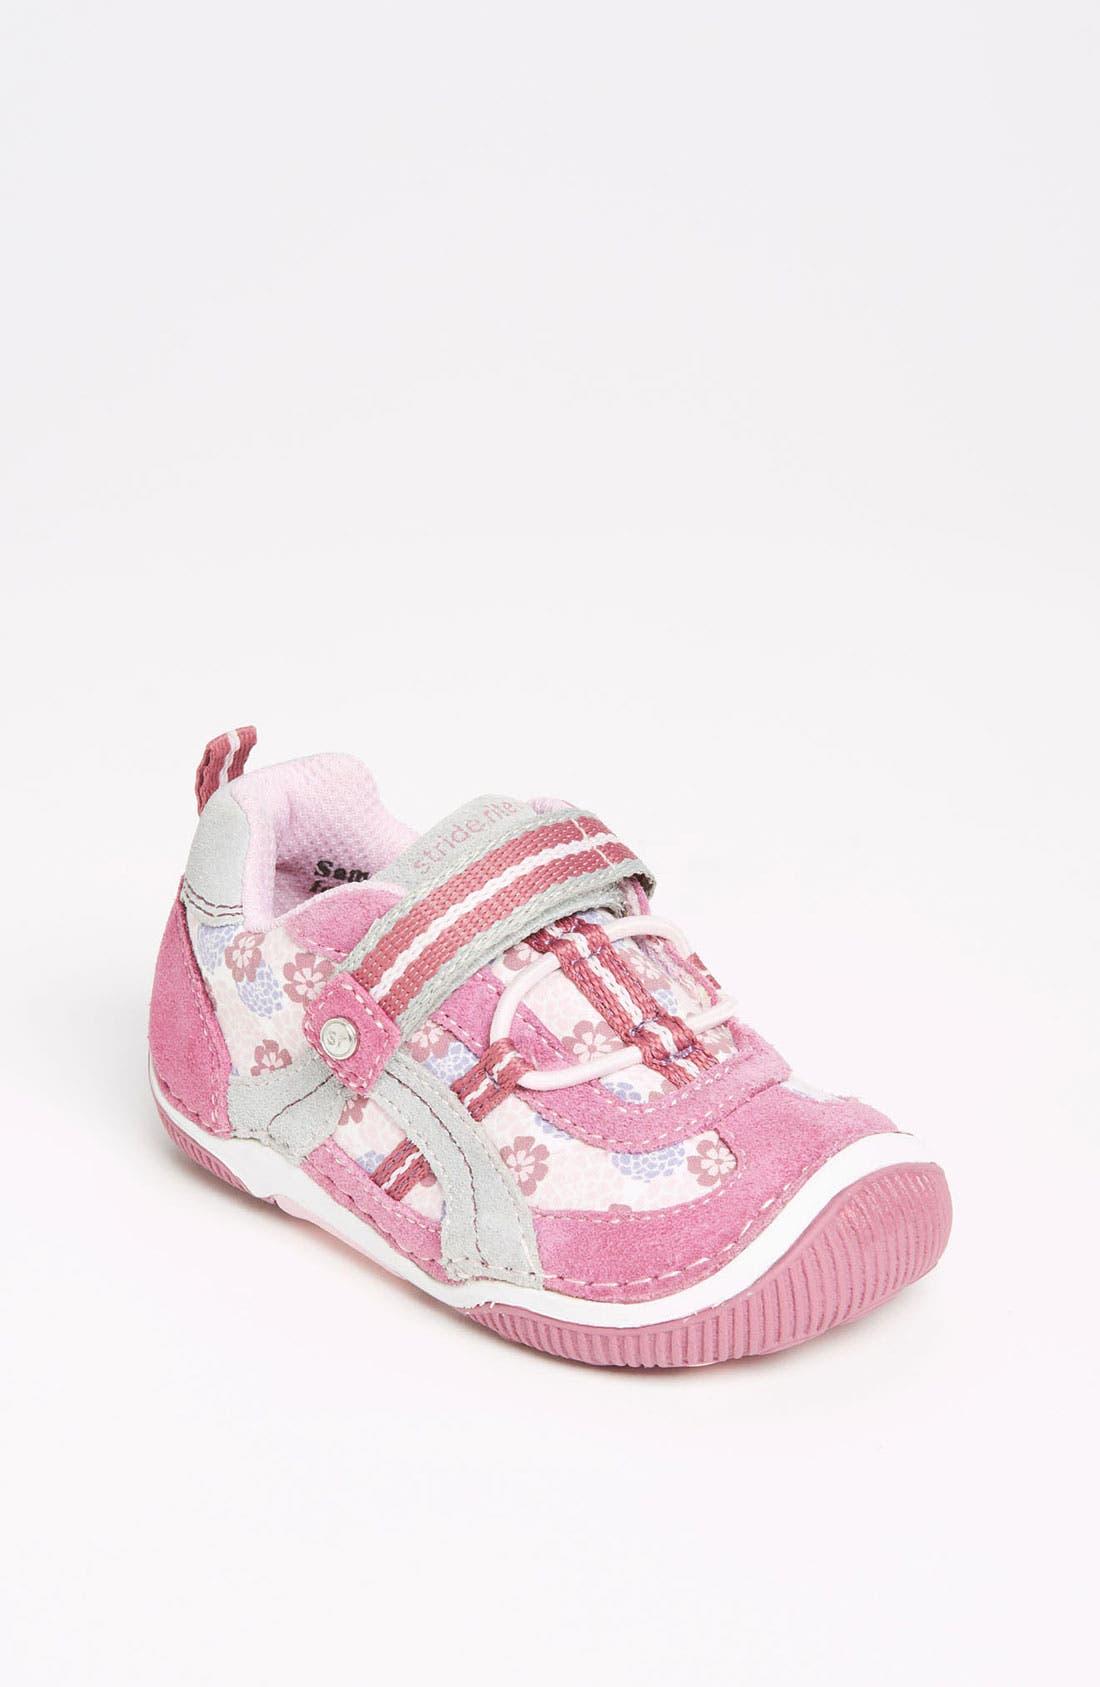 Alternate Image 1 Selected - Stride Rite 'Maive' Sneaker (Baby, Walker & Toddler)